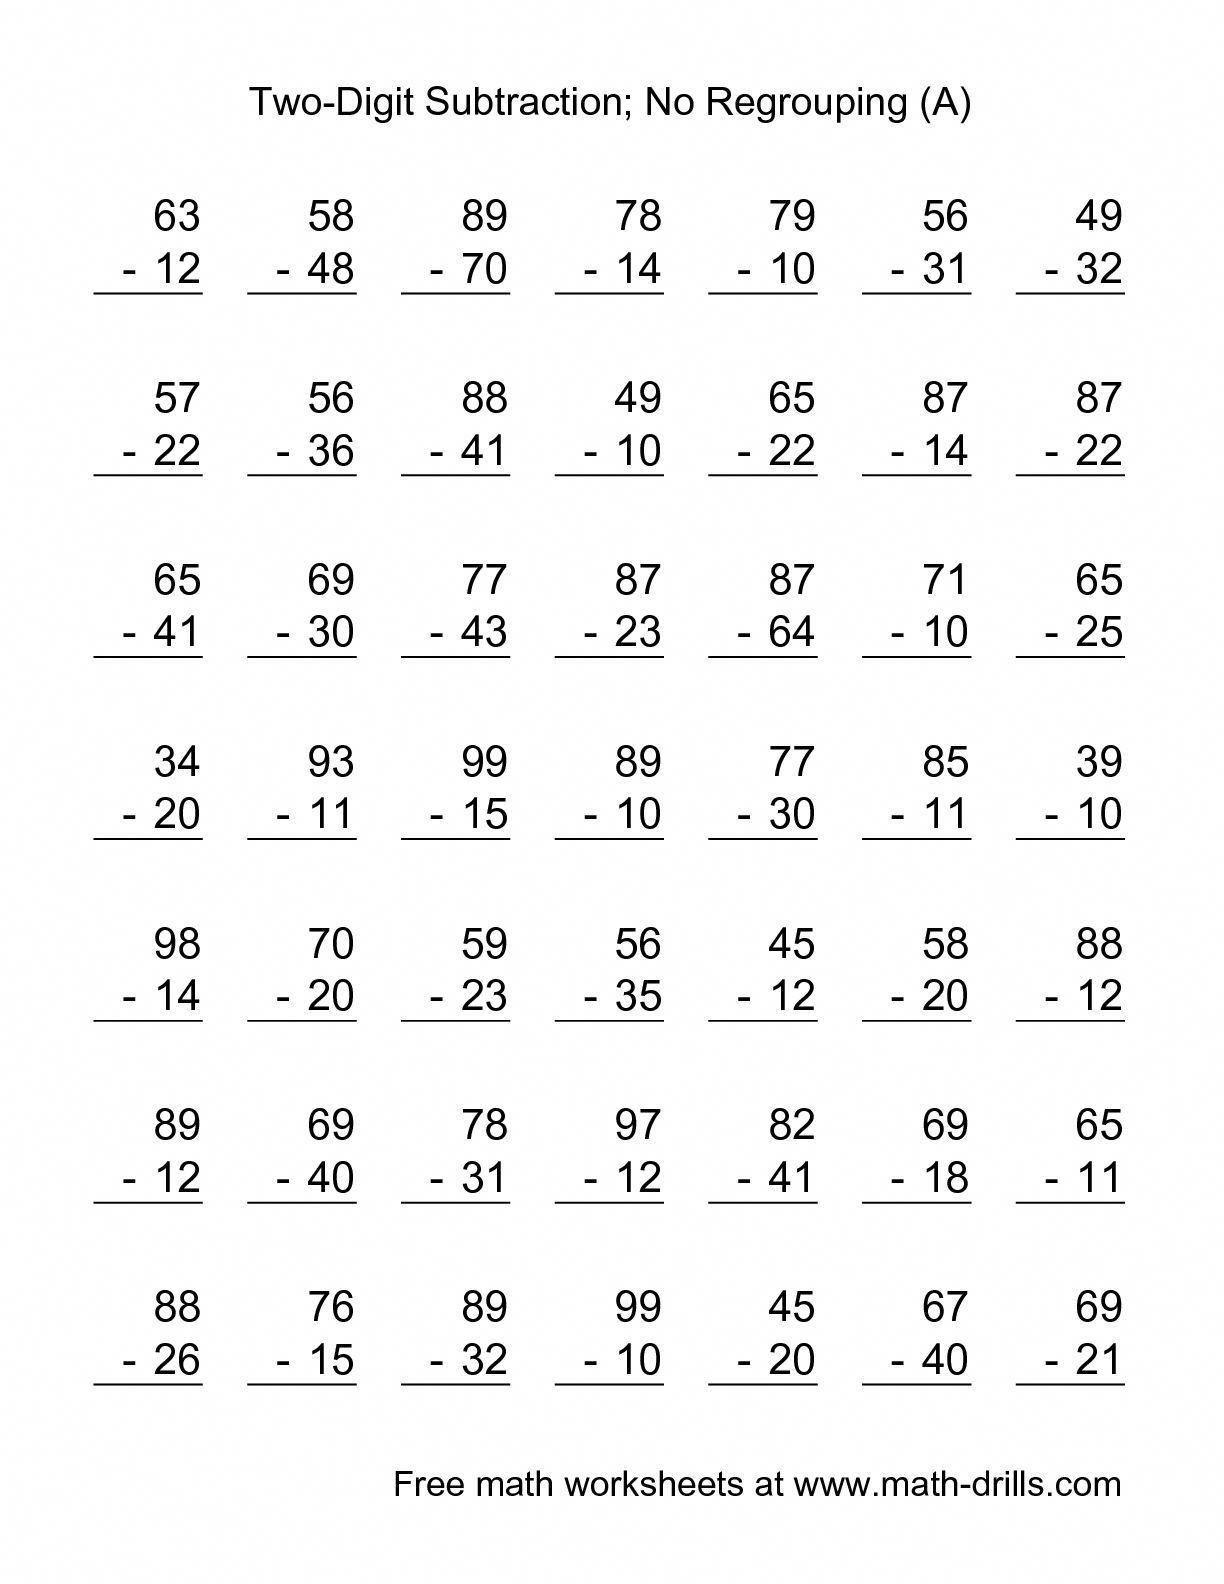 3 Worksheet Free Math Worksheets First Grade 1 Addition